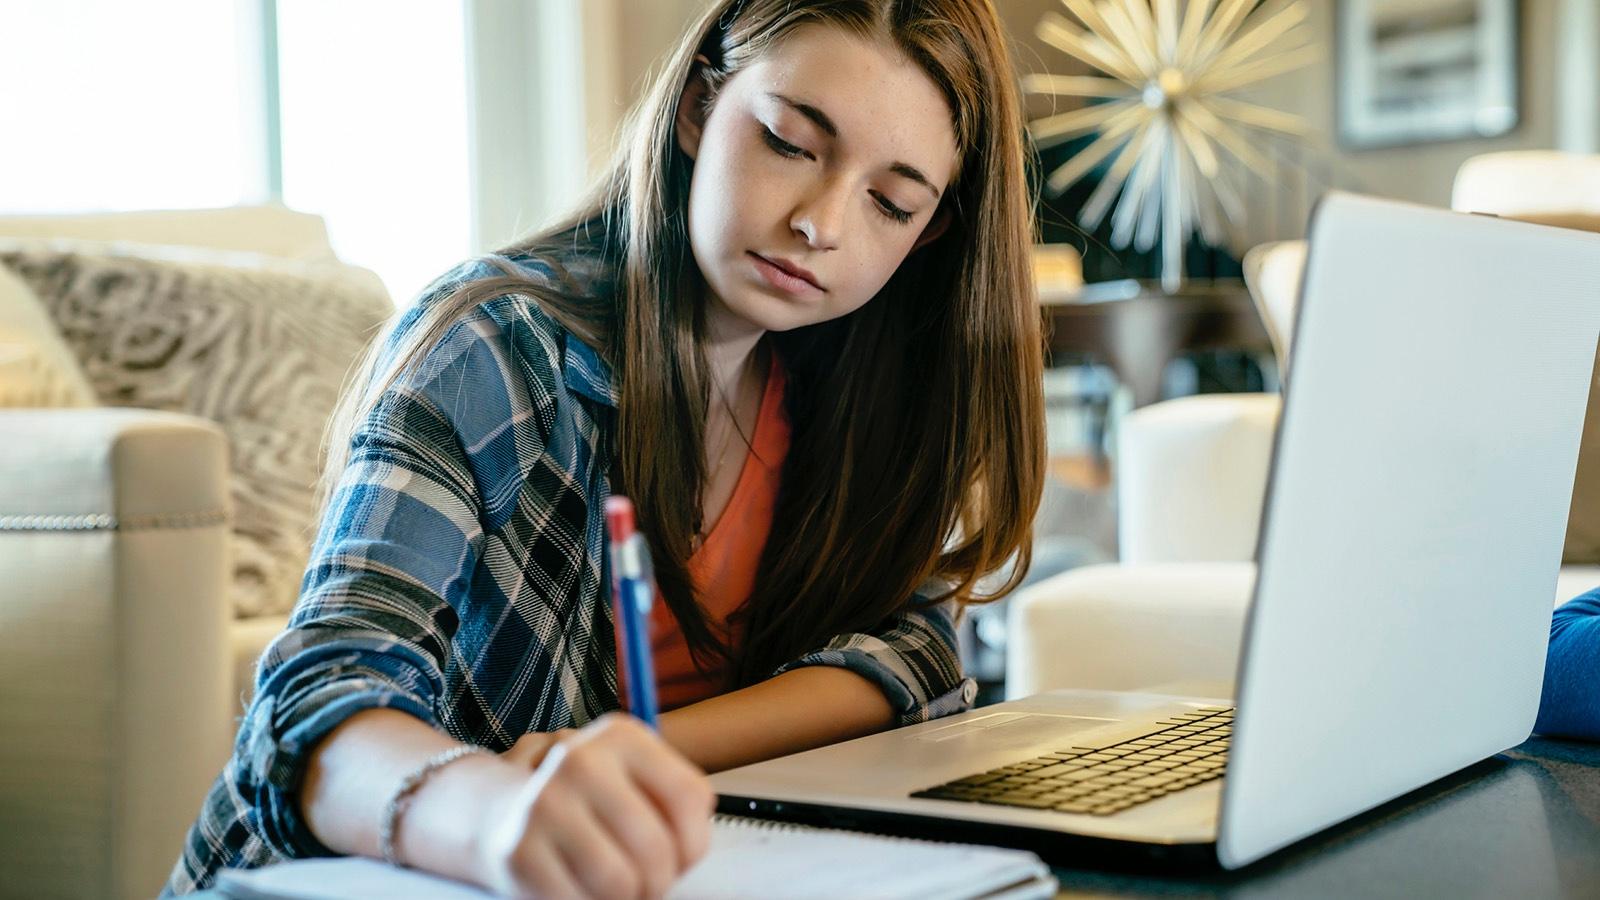 teenage girl writing figurative language